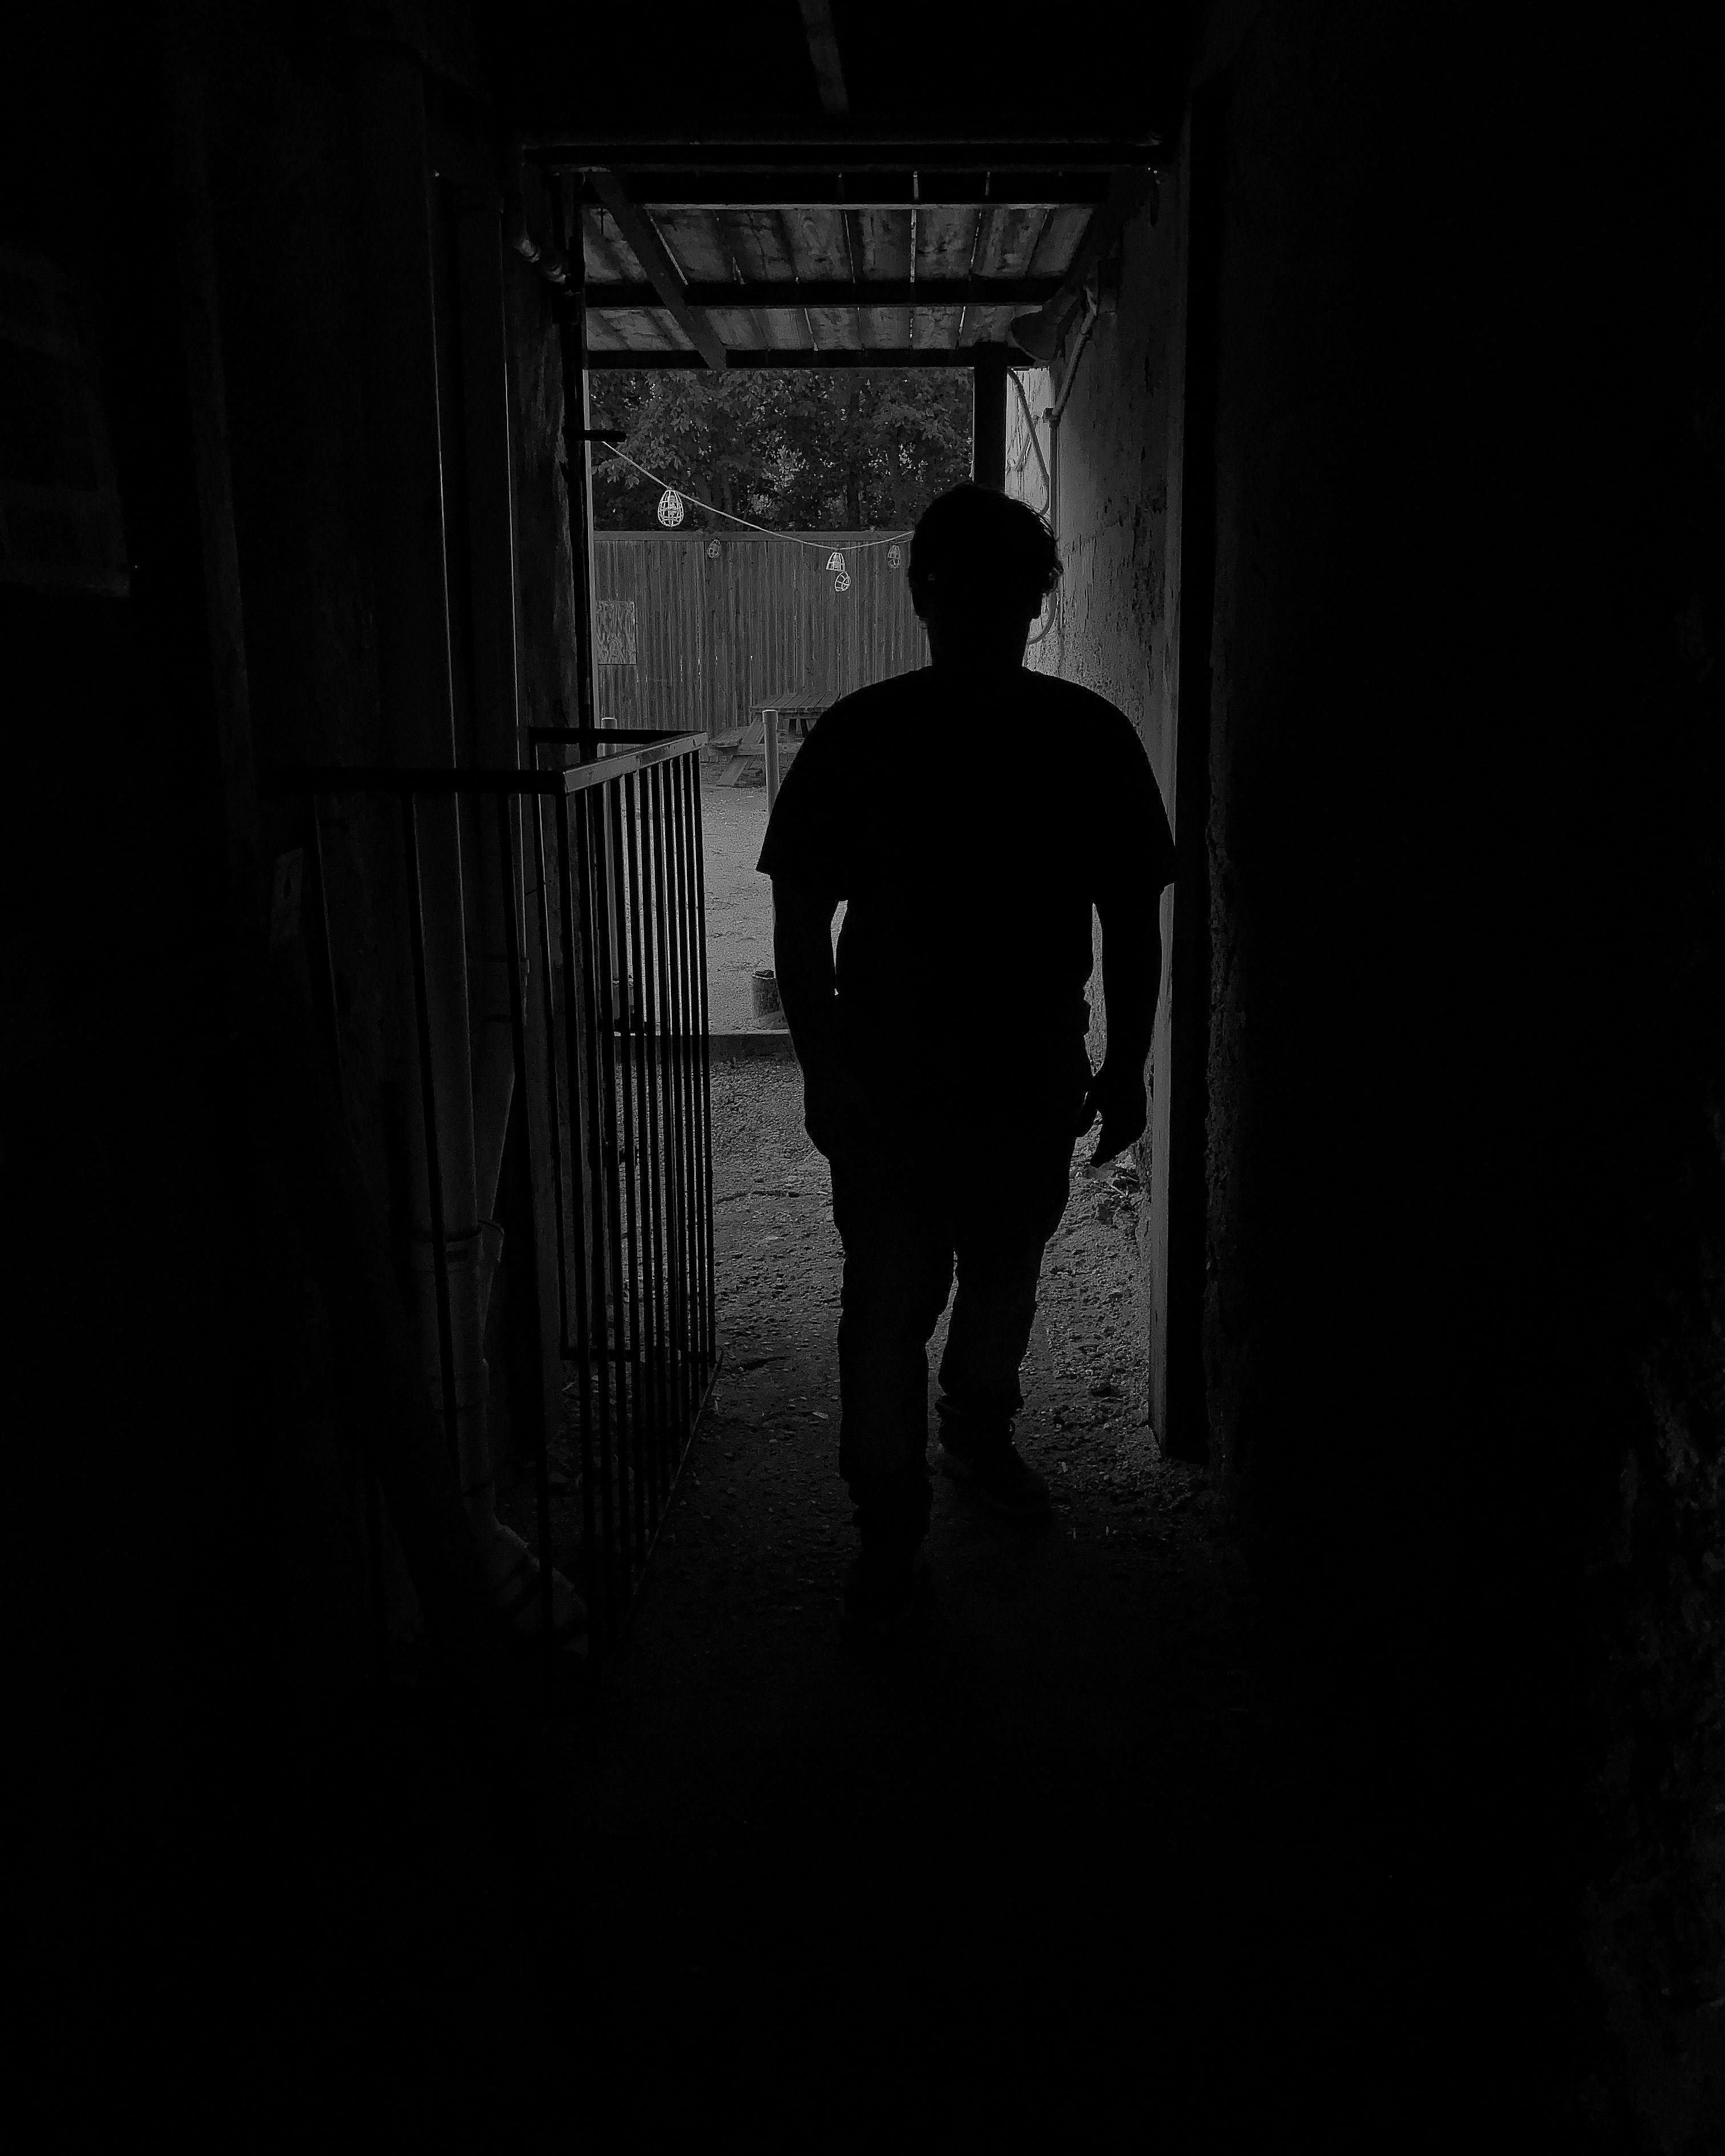 Man Figure Male Figure Shadow Photo Editing